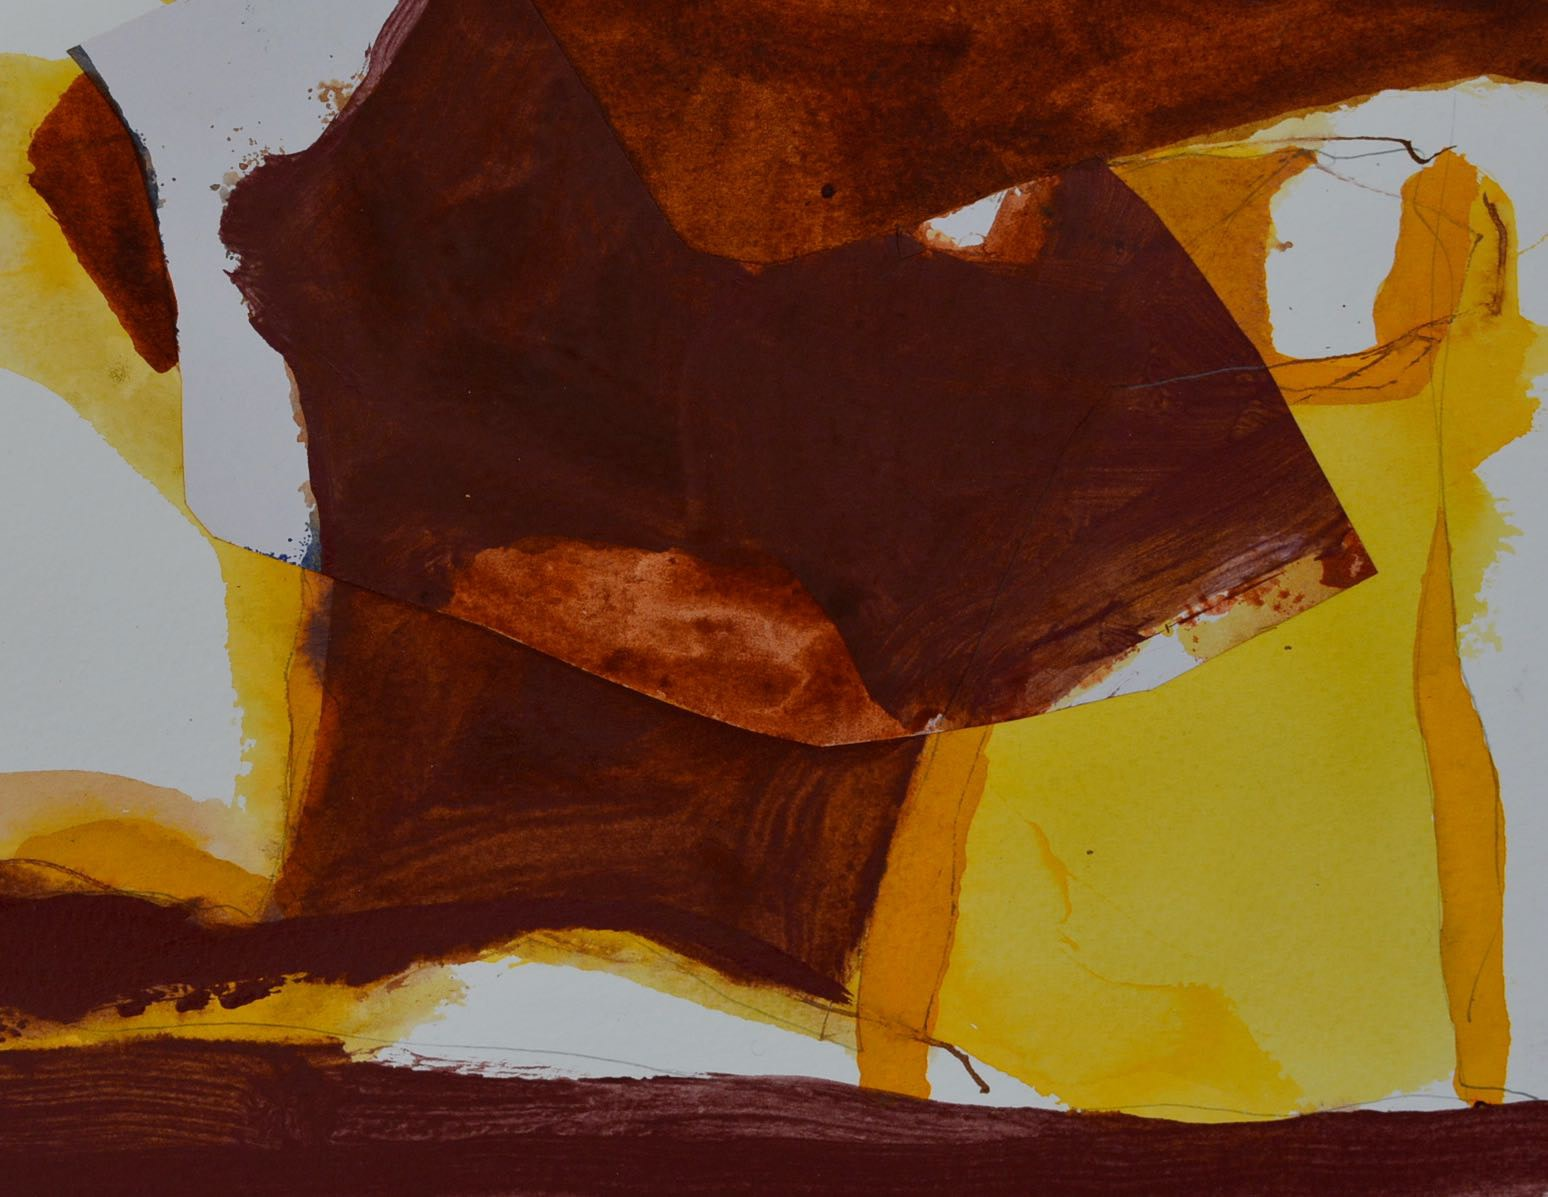 "<span class=""link fancybox-details-link""><a href=""/artists/149-jim-hunter/works/12708-jim-hunter-quarried-landscape-2/"">View Detail Page</a></span><div class=""artist""><span class=""artist""><strong>Jim Hunter</strong></span></div><div class=""title""><em>Quarried Landscape 2</em></div><div class=""medium"">watercolour collage</div><div class=""dimensions"">Artwork: 18 x 22cm</div><div class=""price"">£350.00</div>"